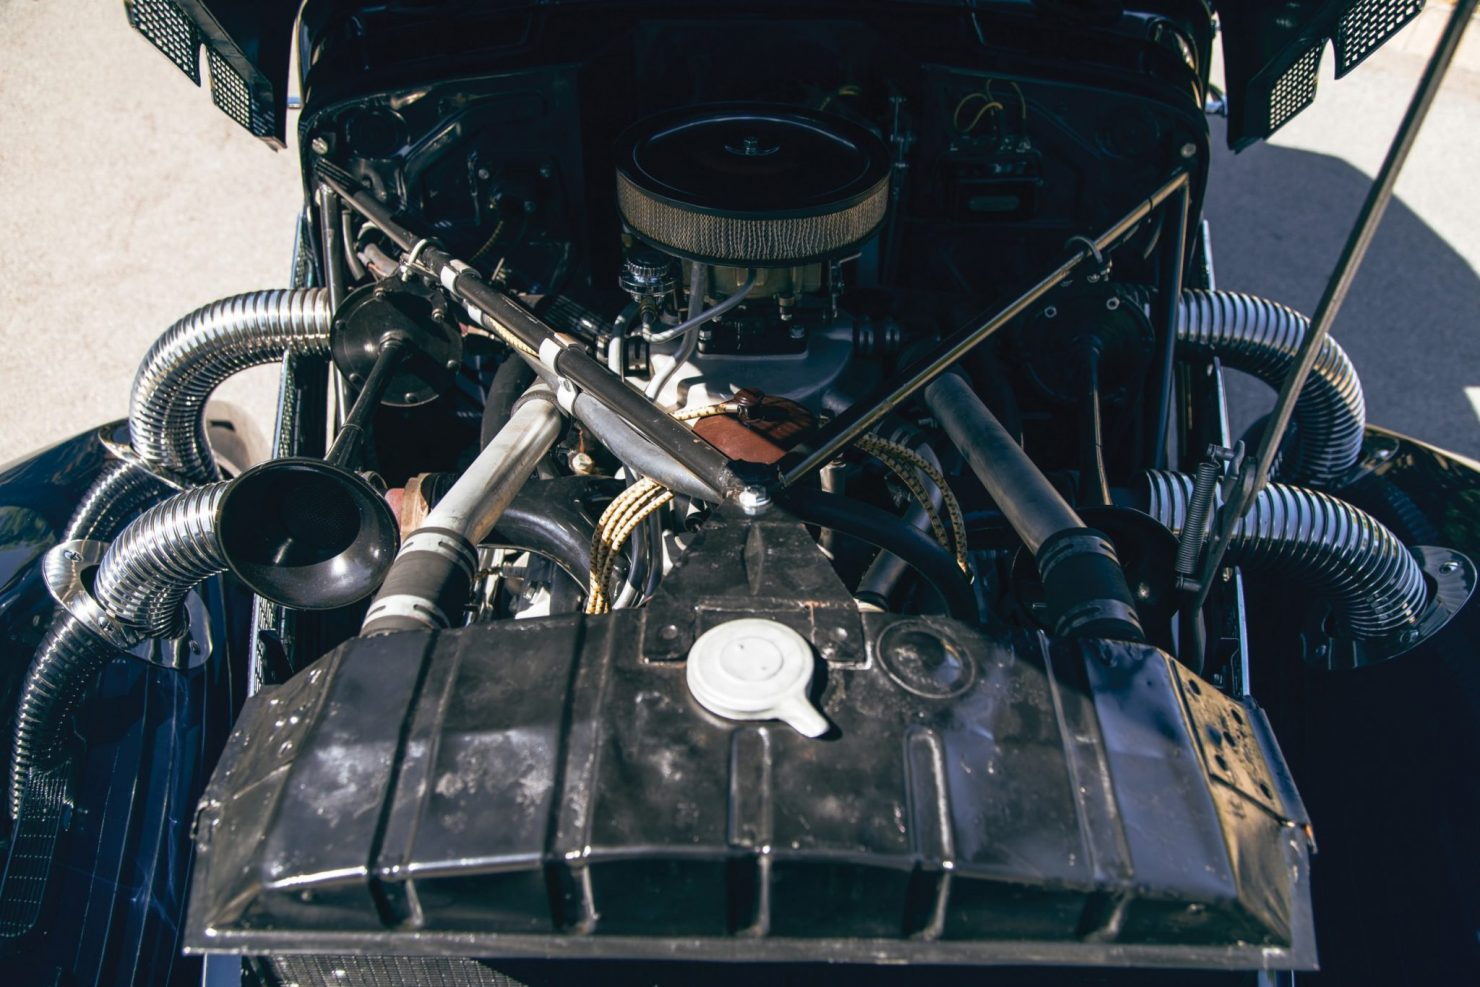 cord 812 supercharged phaeton 3 1480x987 - 1937 Cord 812 Supercharged Phaeton